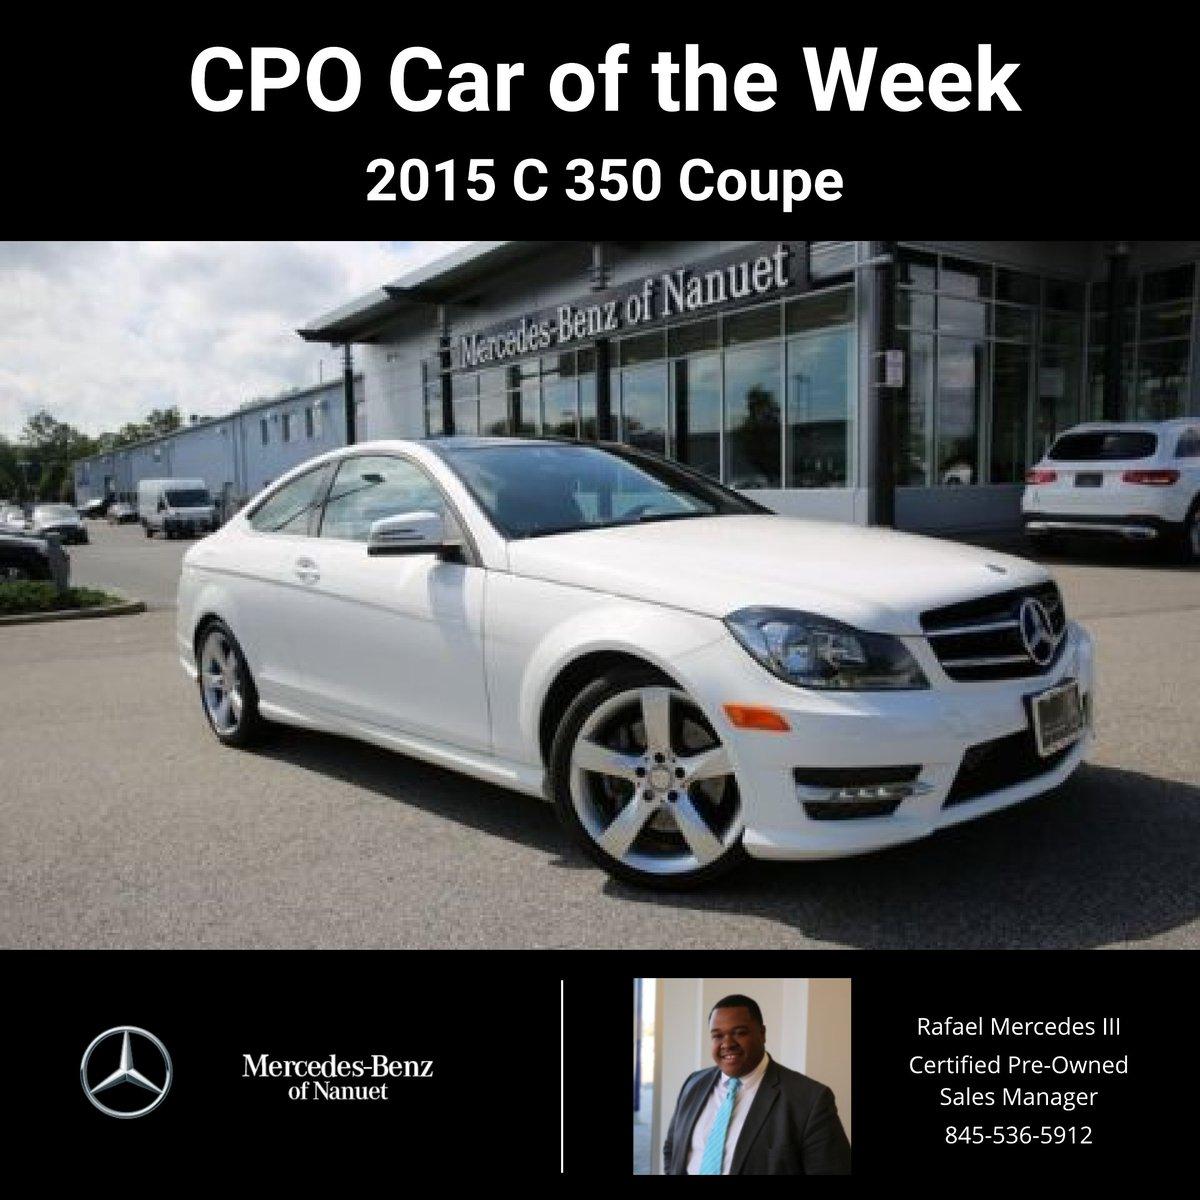 #MercedesBenz #MBUSA #CarofTheWeek #MBNanuet #Nanuet #C350 #Coupe  Http://ow.ly/QWOH50ibTfE Pic.twitter.com/Nlvctyp1jp